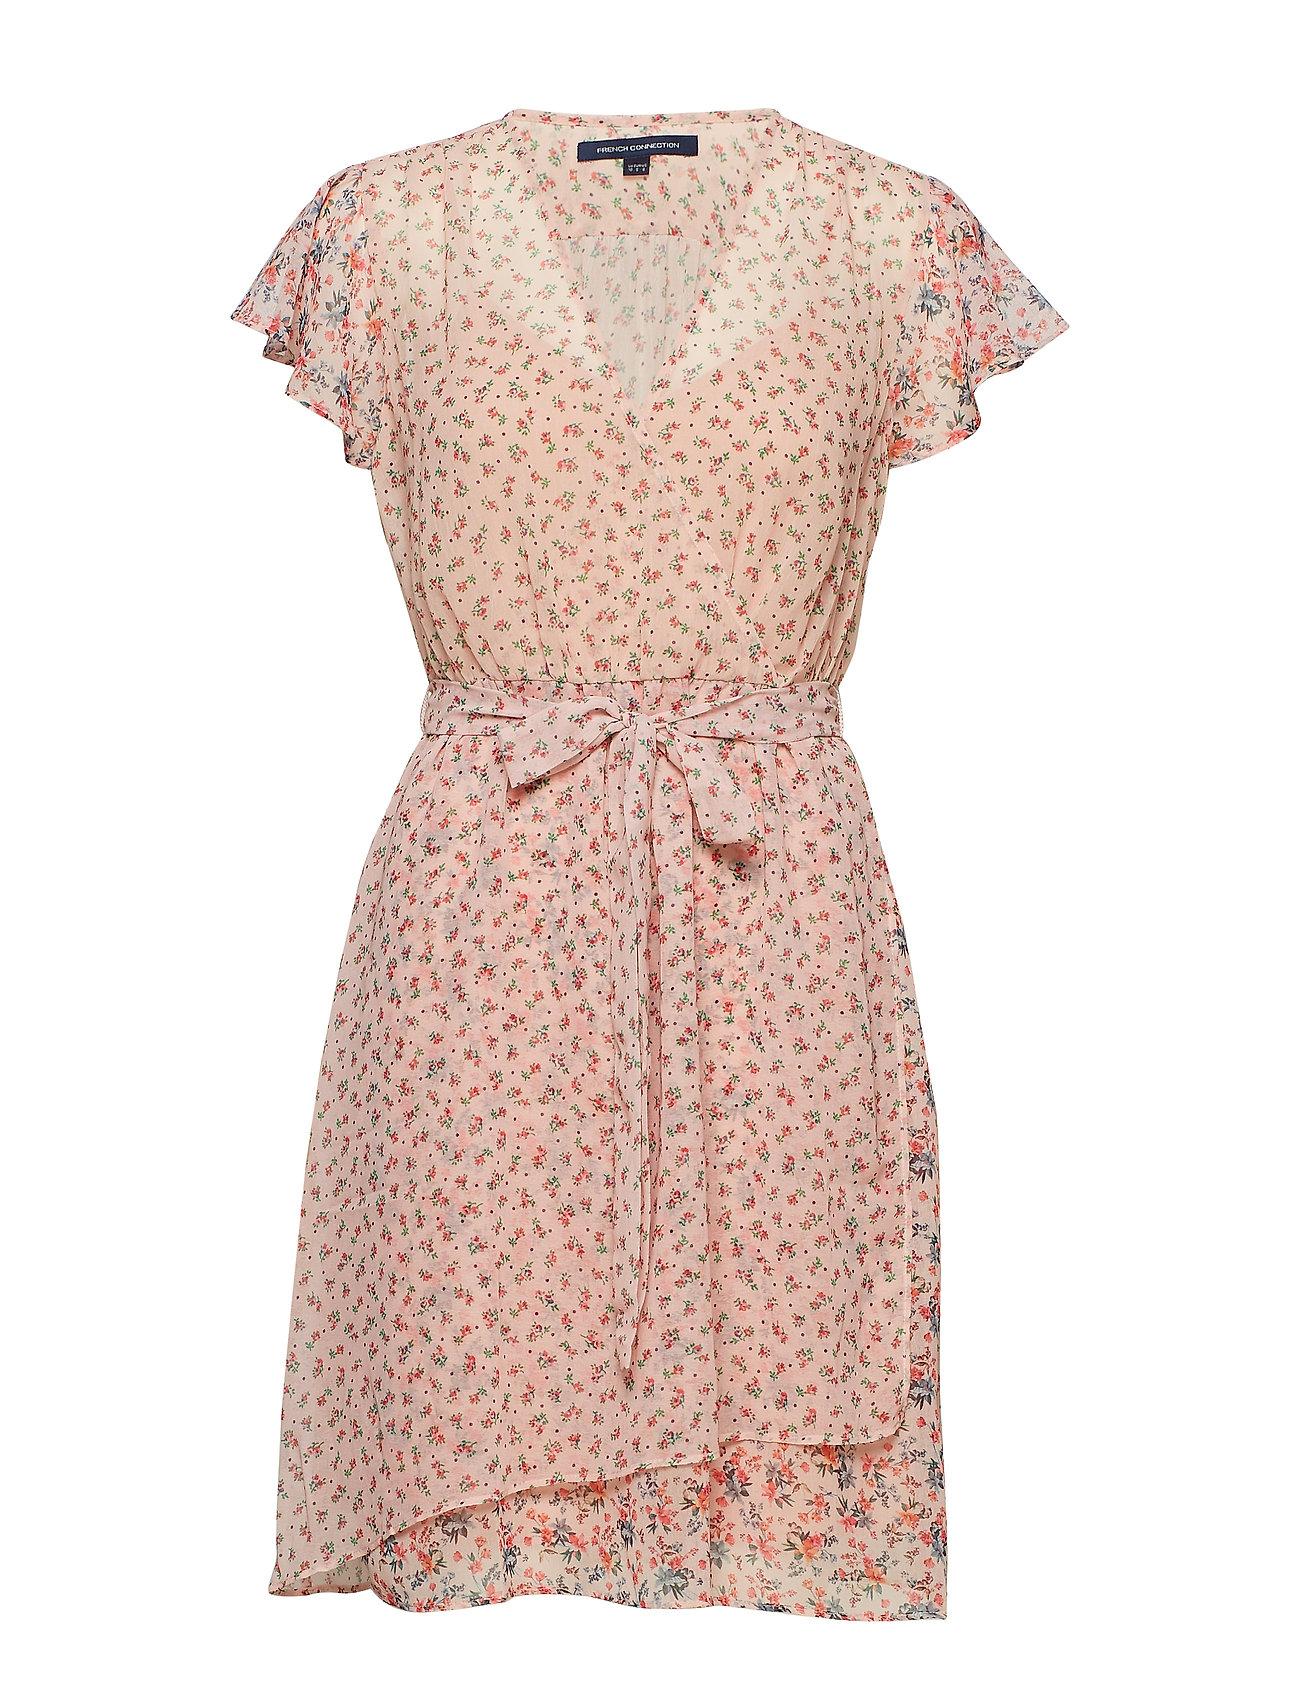 French Connection CELESTIA SHEER WRAP DRESS - SATIN SLIPPER